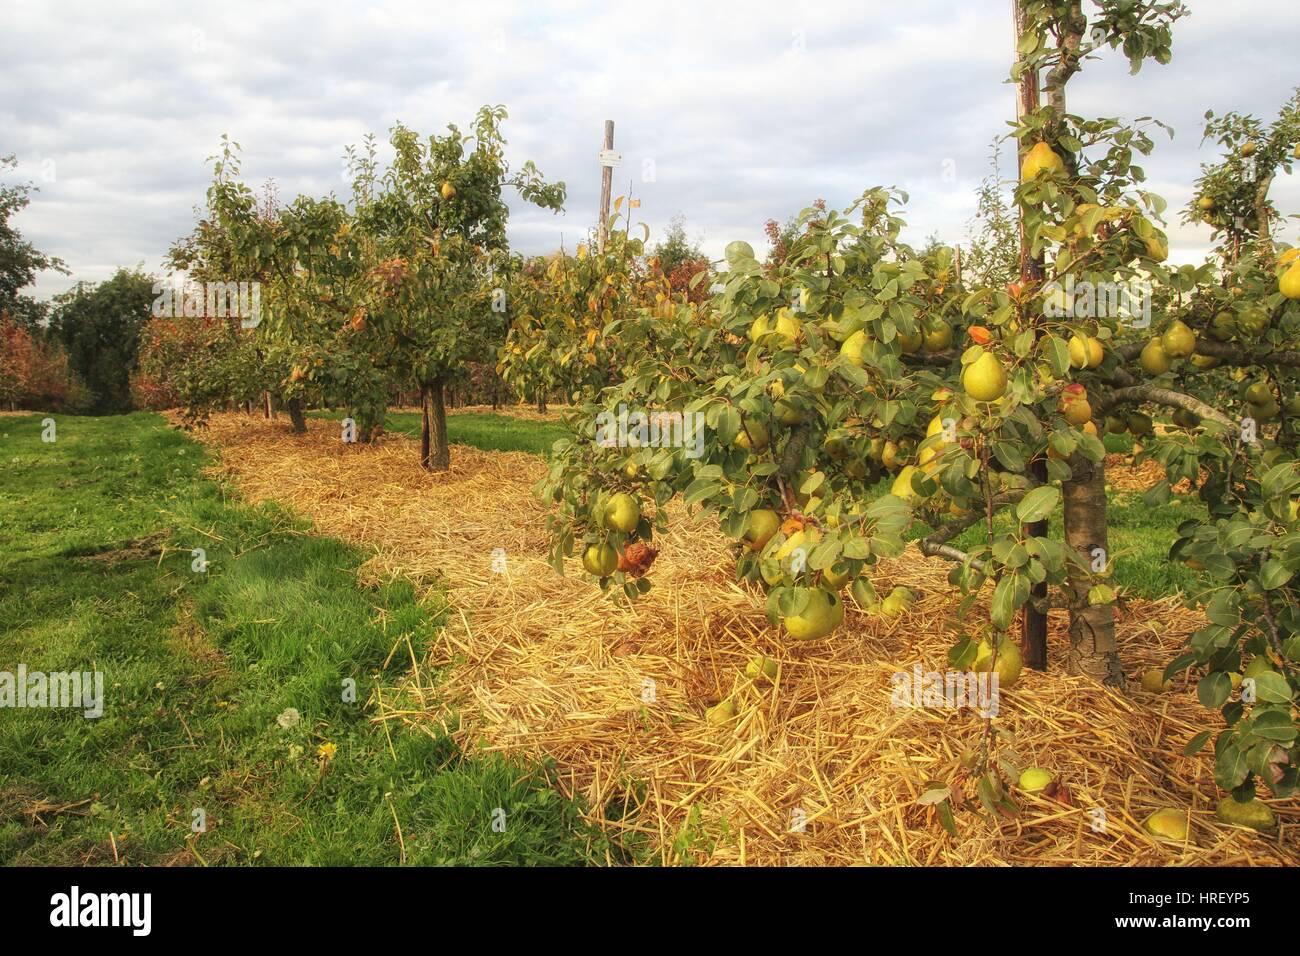 Ripe pear fruit on trees in the autumn fall sunshine - Stock Image